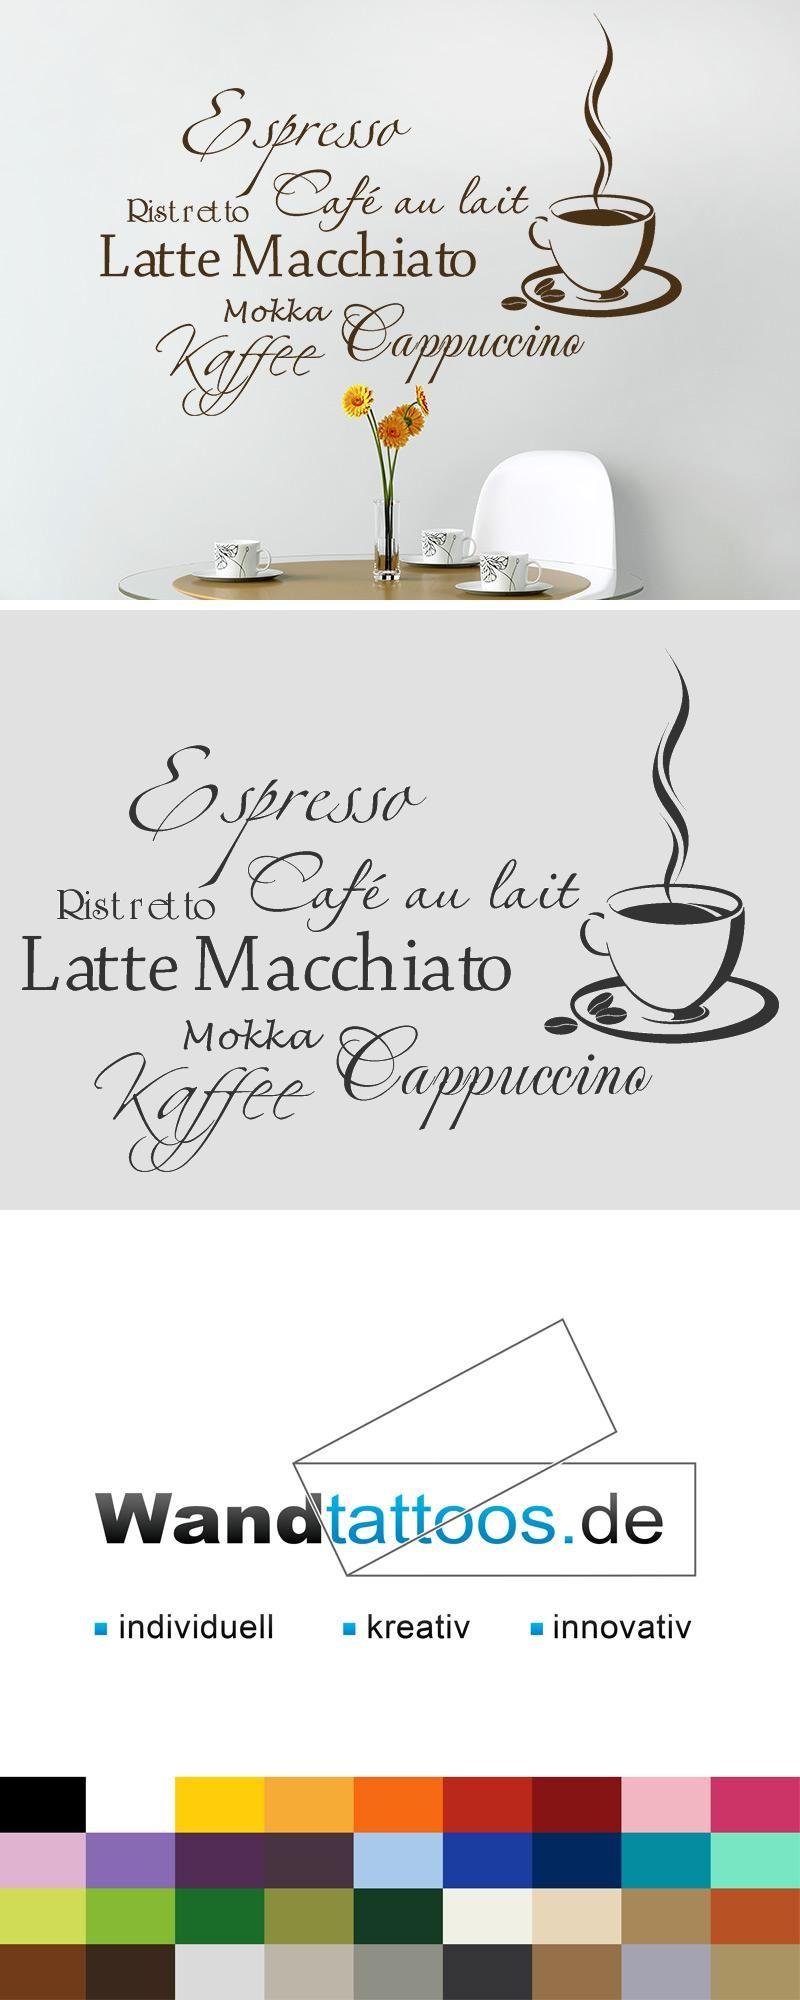 Wandtattoo Kaffee Aroma mit Kaffeetasse   Wandgestaltung küche ...